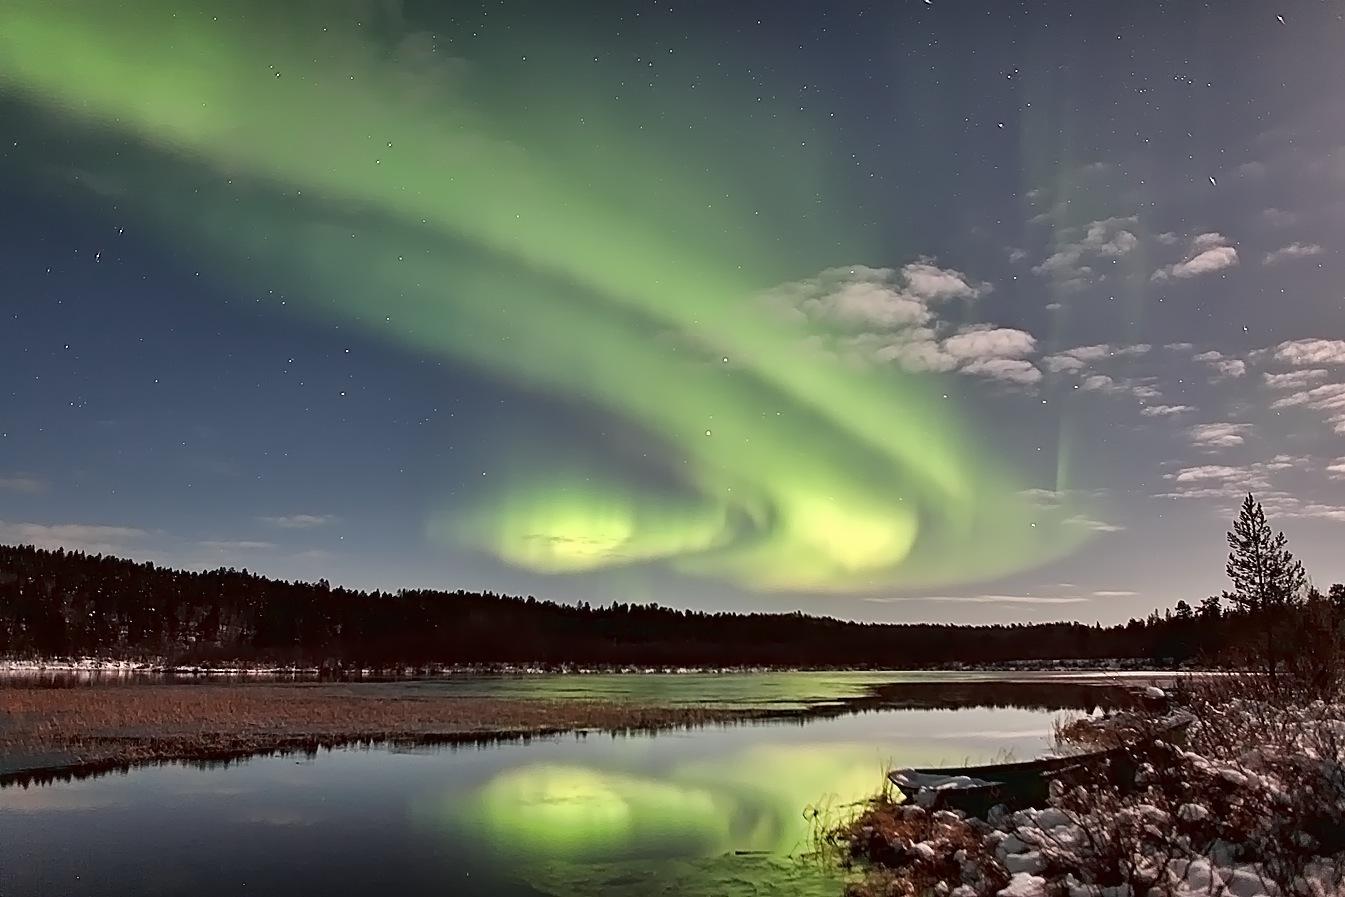 Aurora Photographer Andy Keen